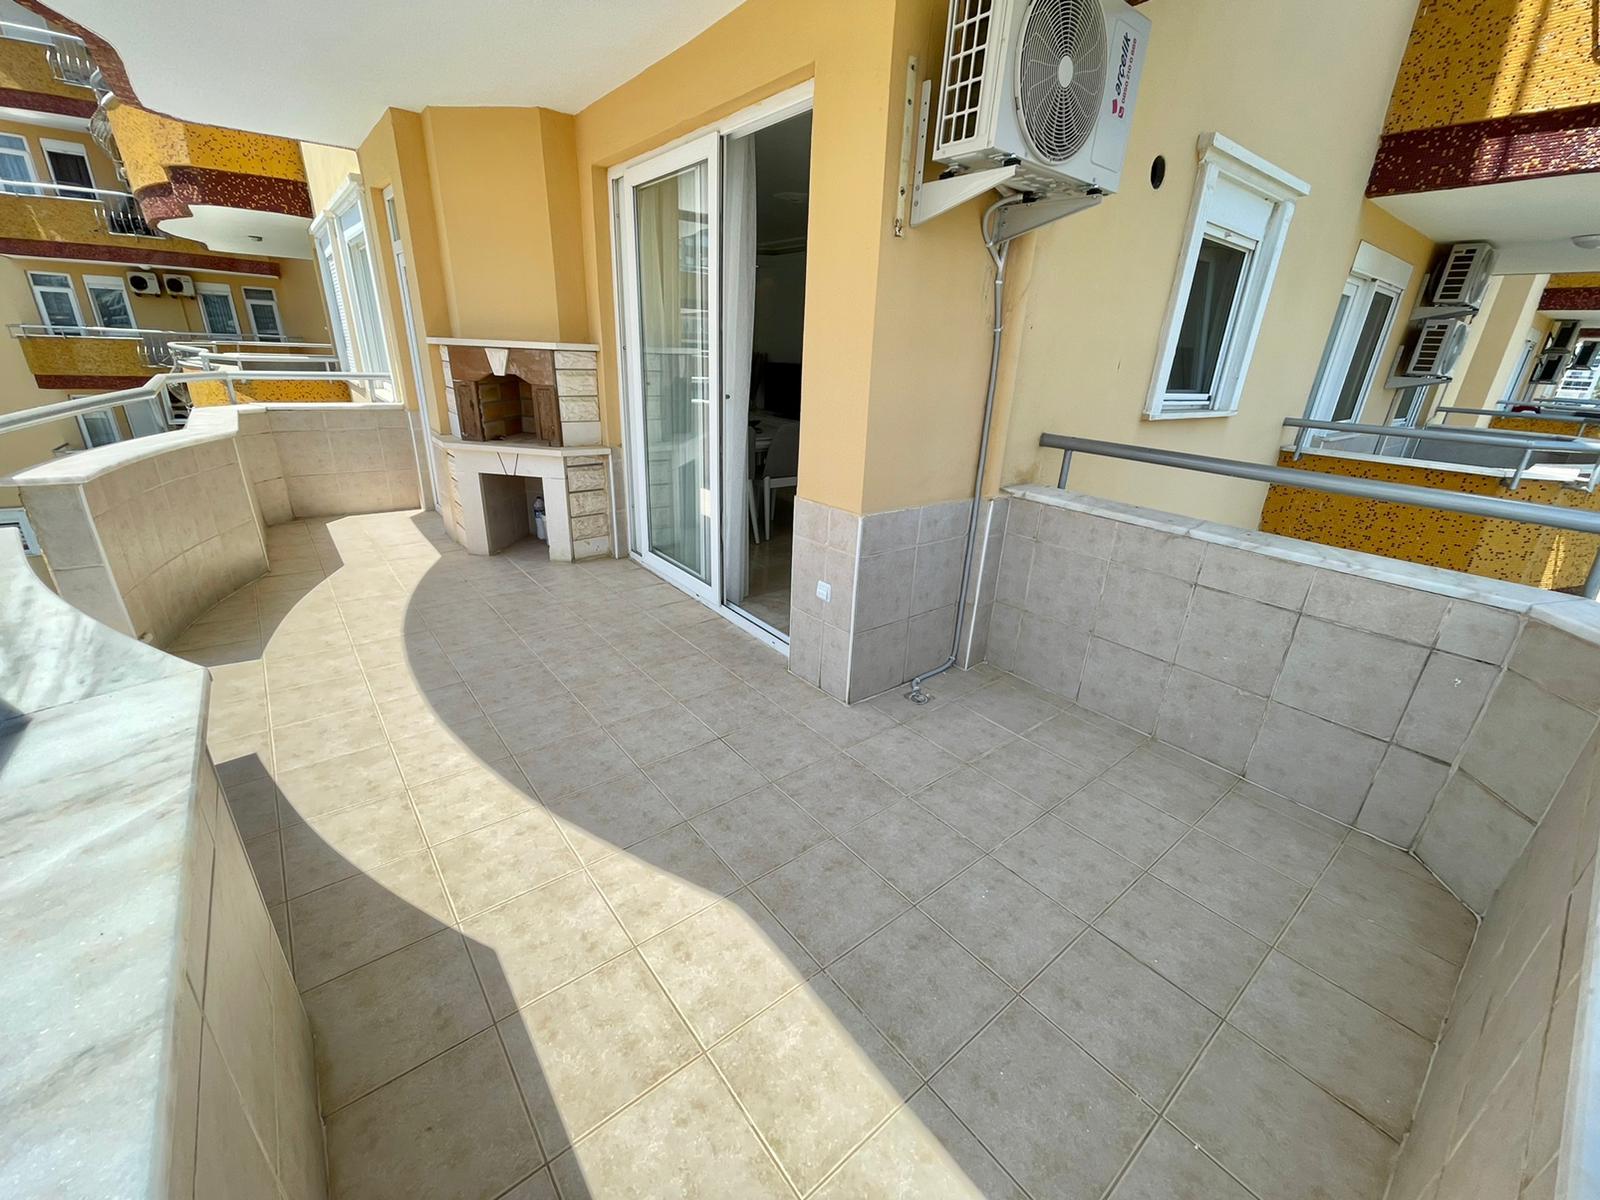 Трёхкомнатная квартира в «двух шагах» от Средиземного моря - Фото 23